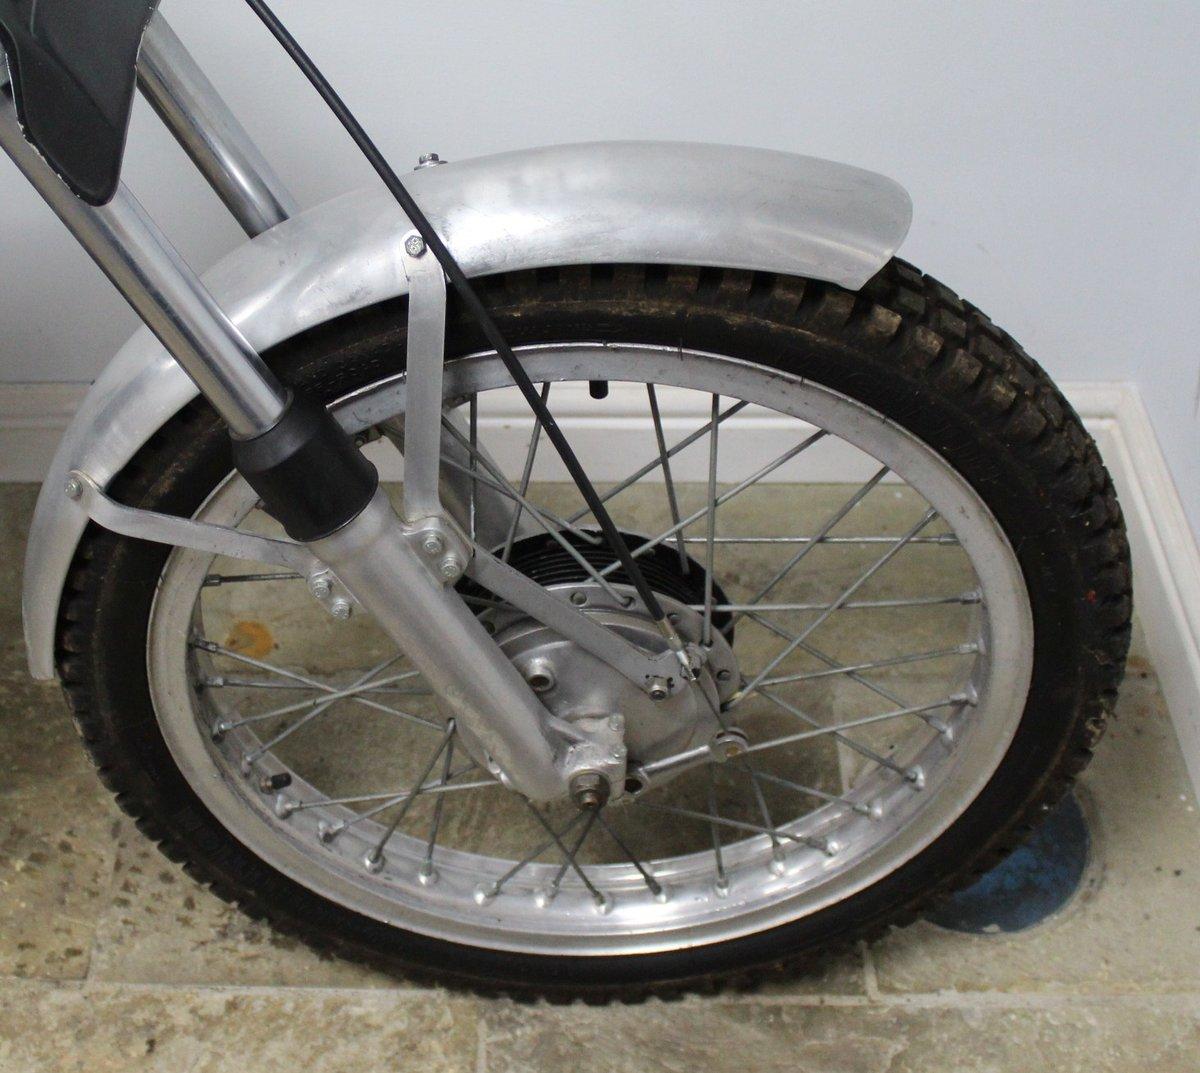 1965 Bultaco Model 10 Radial Head Rare Trials Bike For Sale (picture 4 of 6)